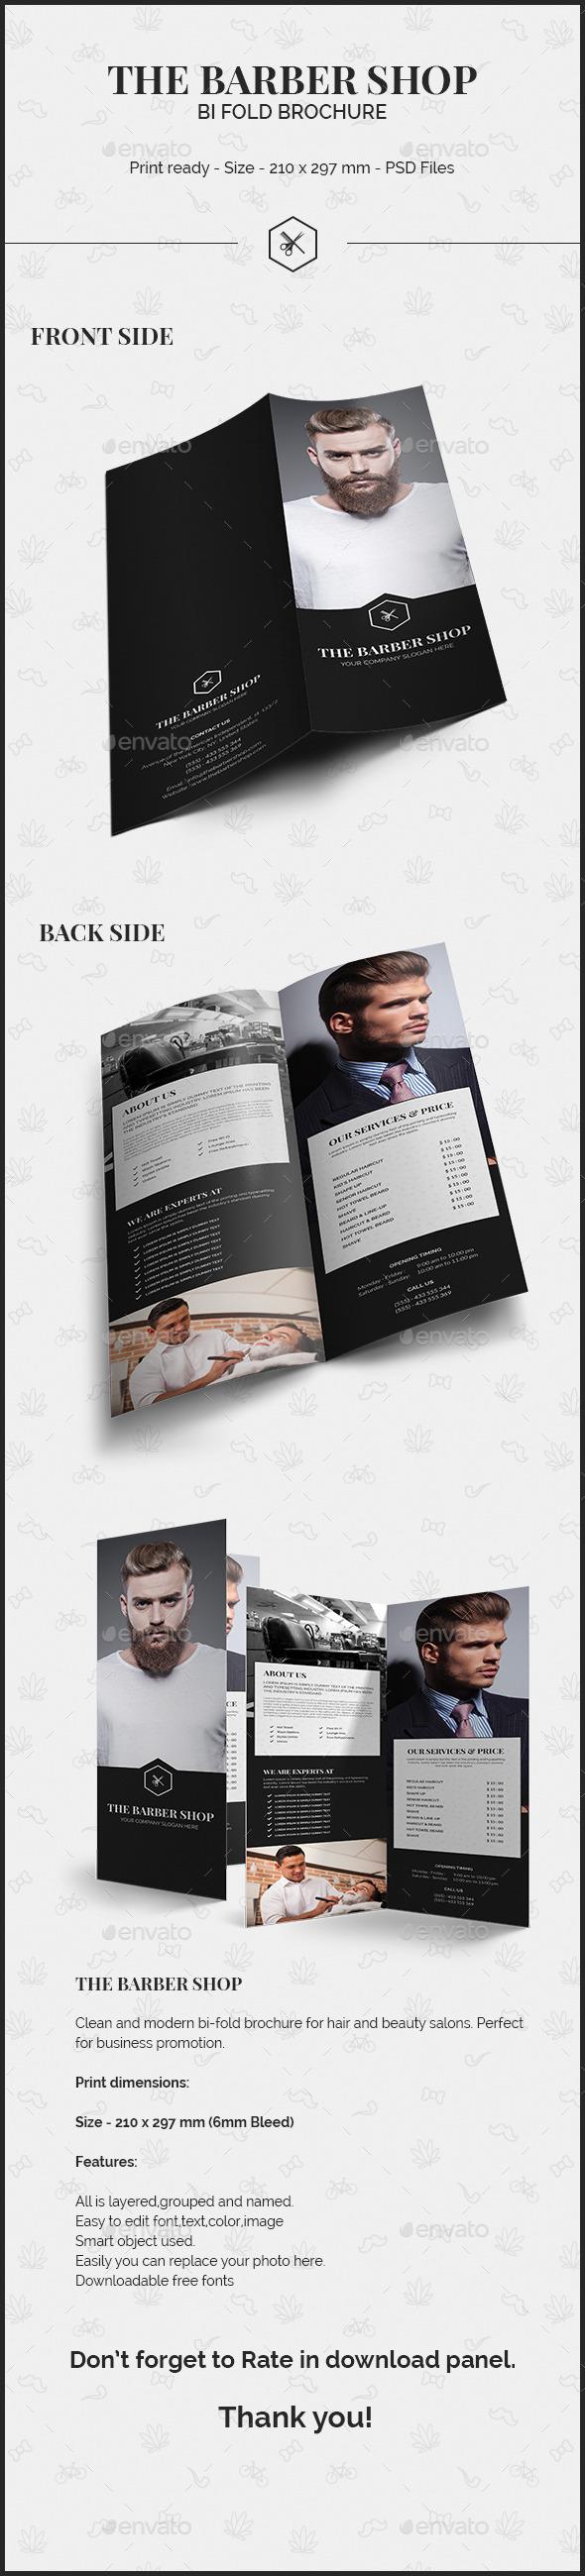 GraphicRiver The Barber Shop Bi Fold Brochure 10107686